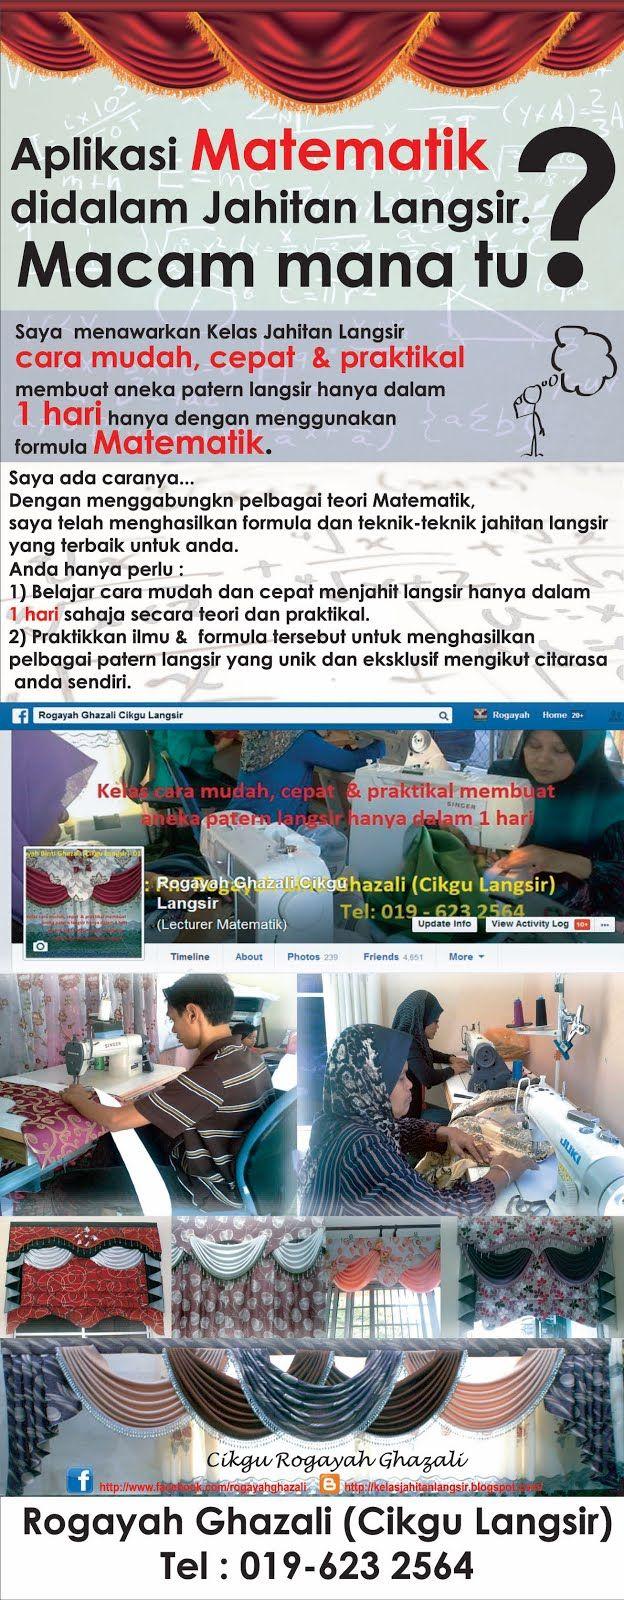 Belajar Jahit Langsir Cara Mudah Hanya Dlm 1 Hari Rogayah Ghazali Cikgu Langsir 019 623 2564 Pandora Screenshot